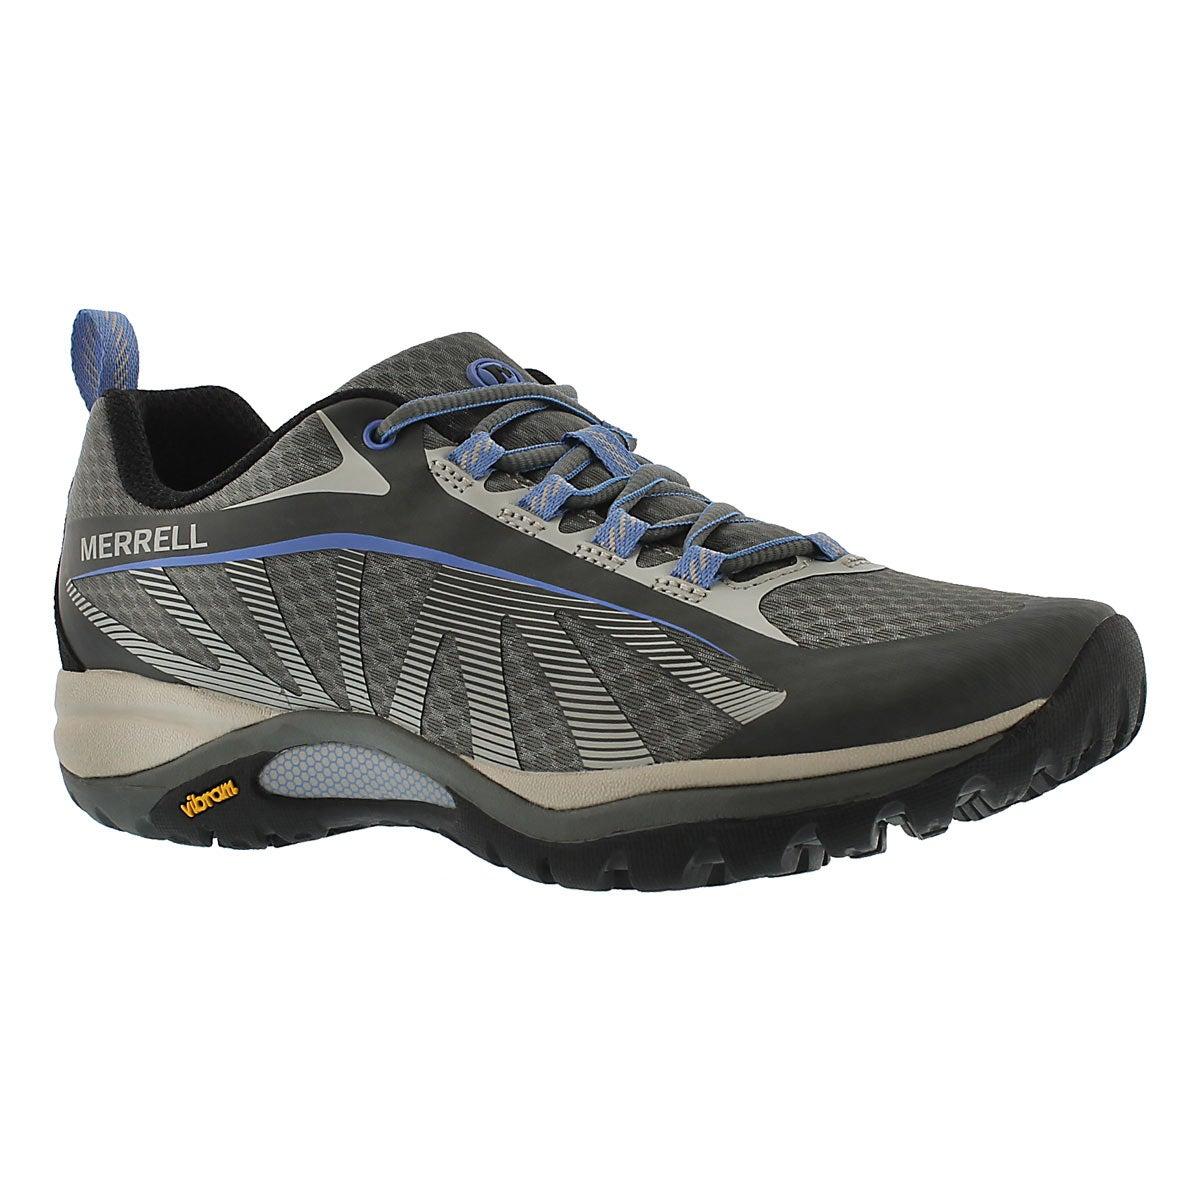 Lds Siren Edge grey hiking shoe